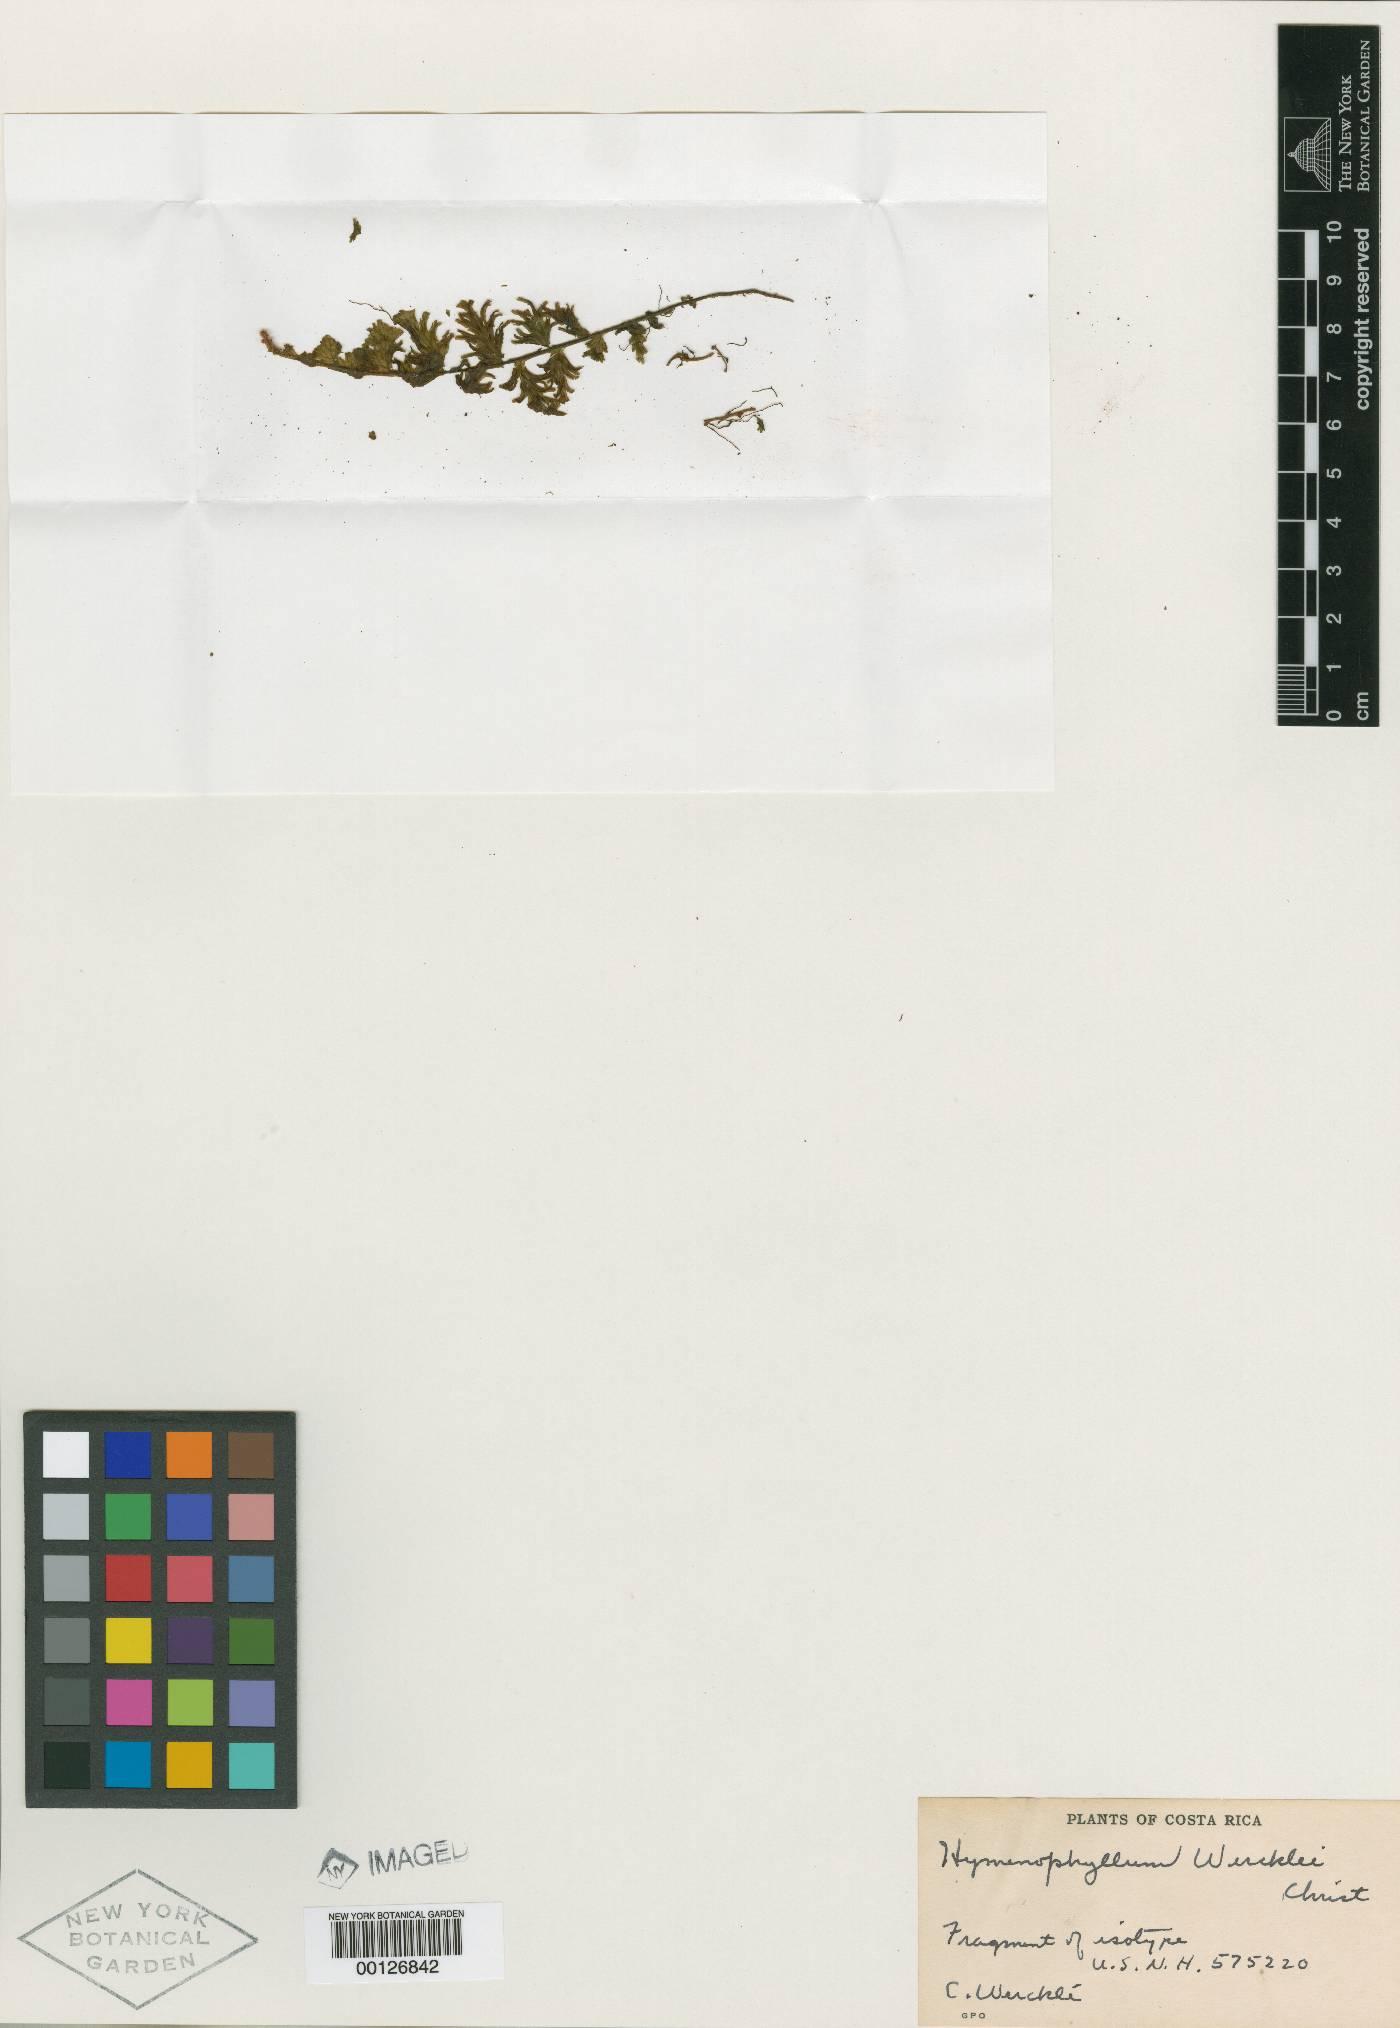 Hymenophyllum sieberi image